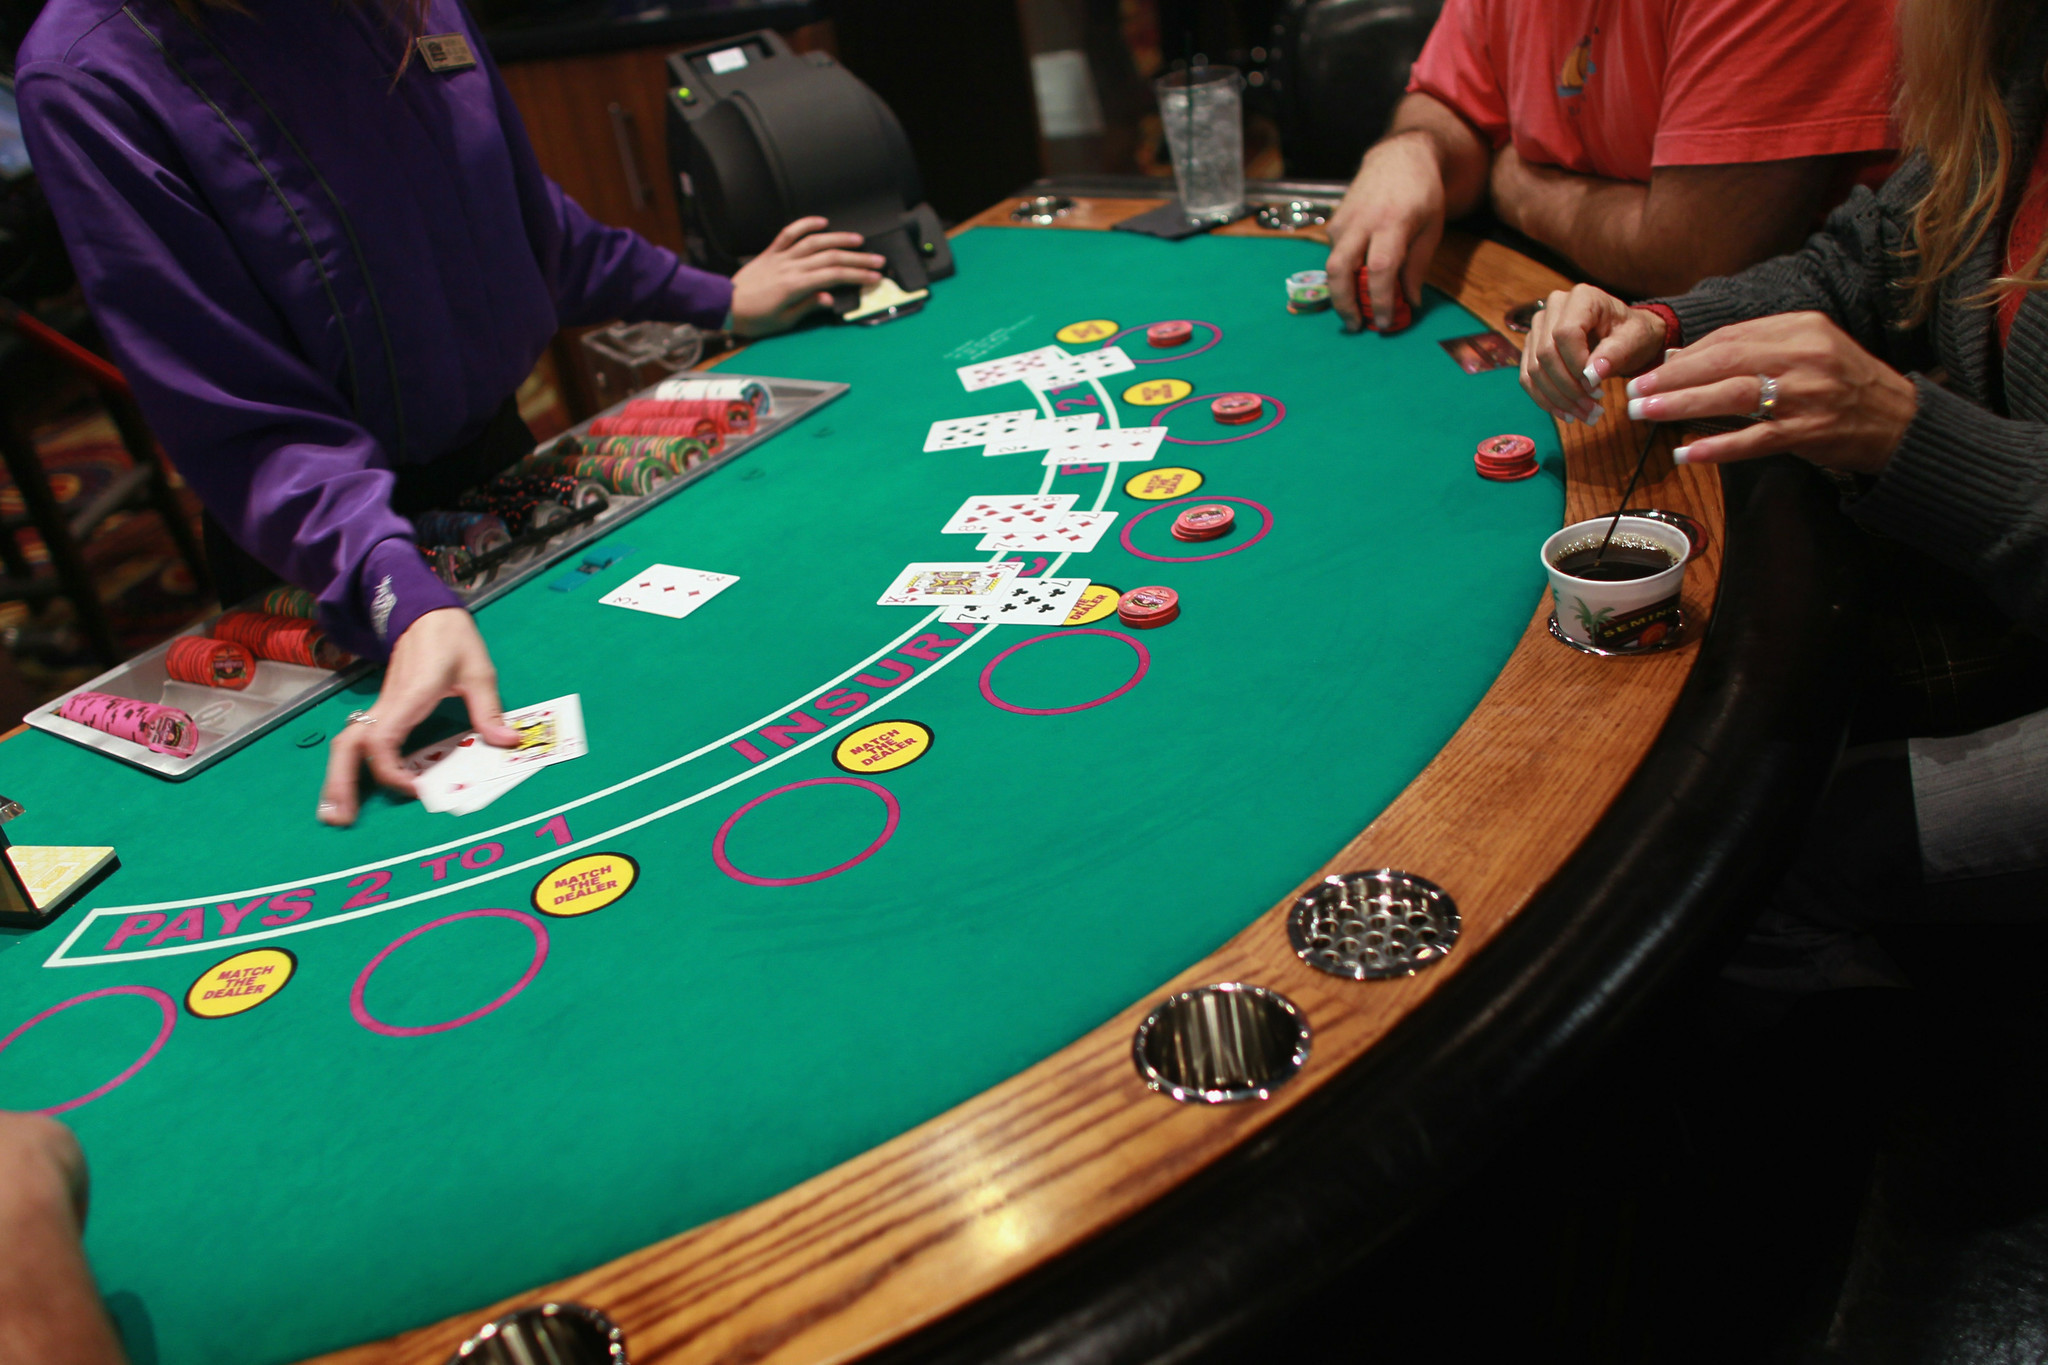 South florida casinos with blackjack soccer gambling usa